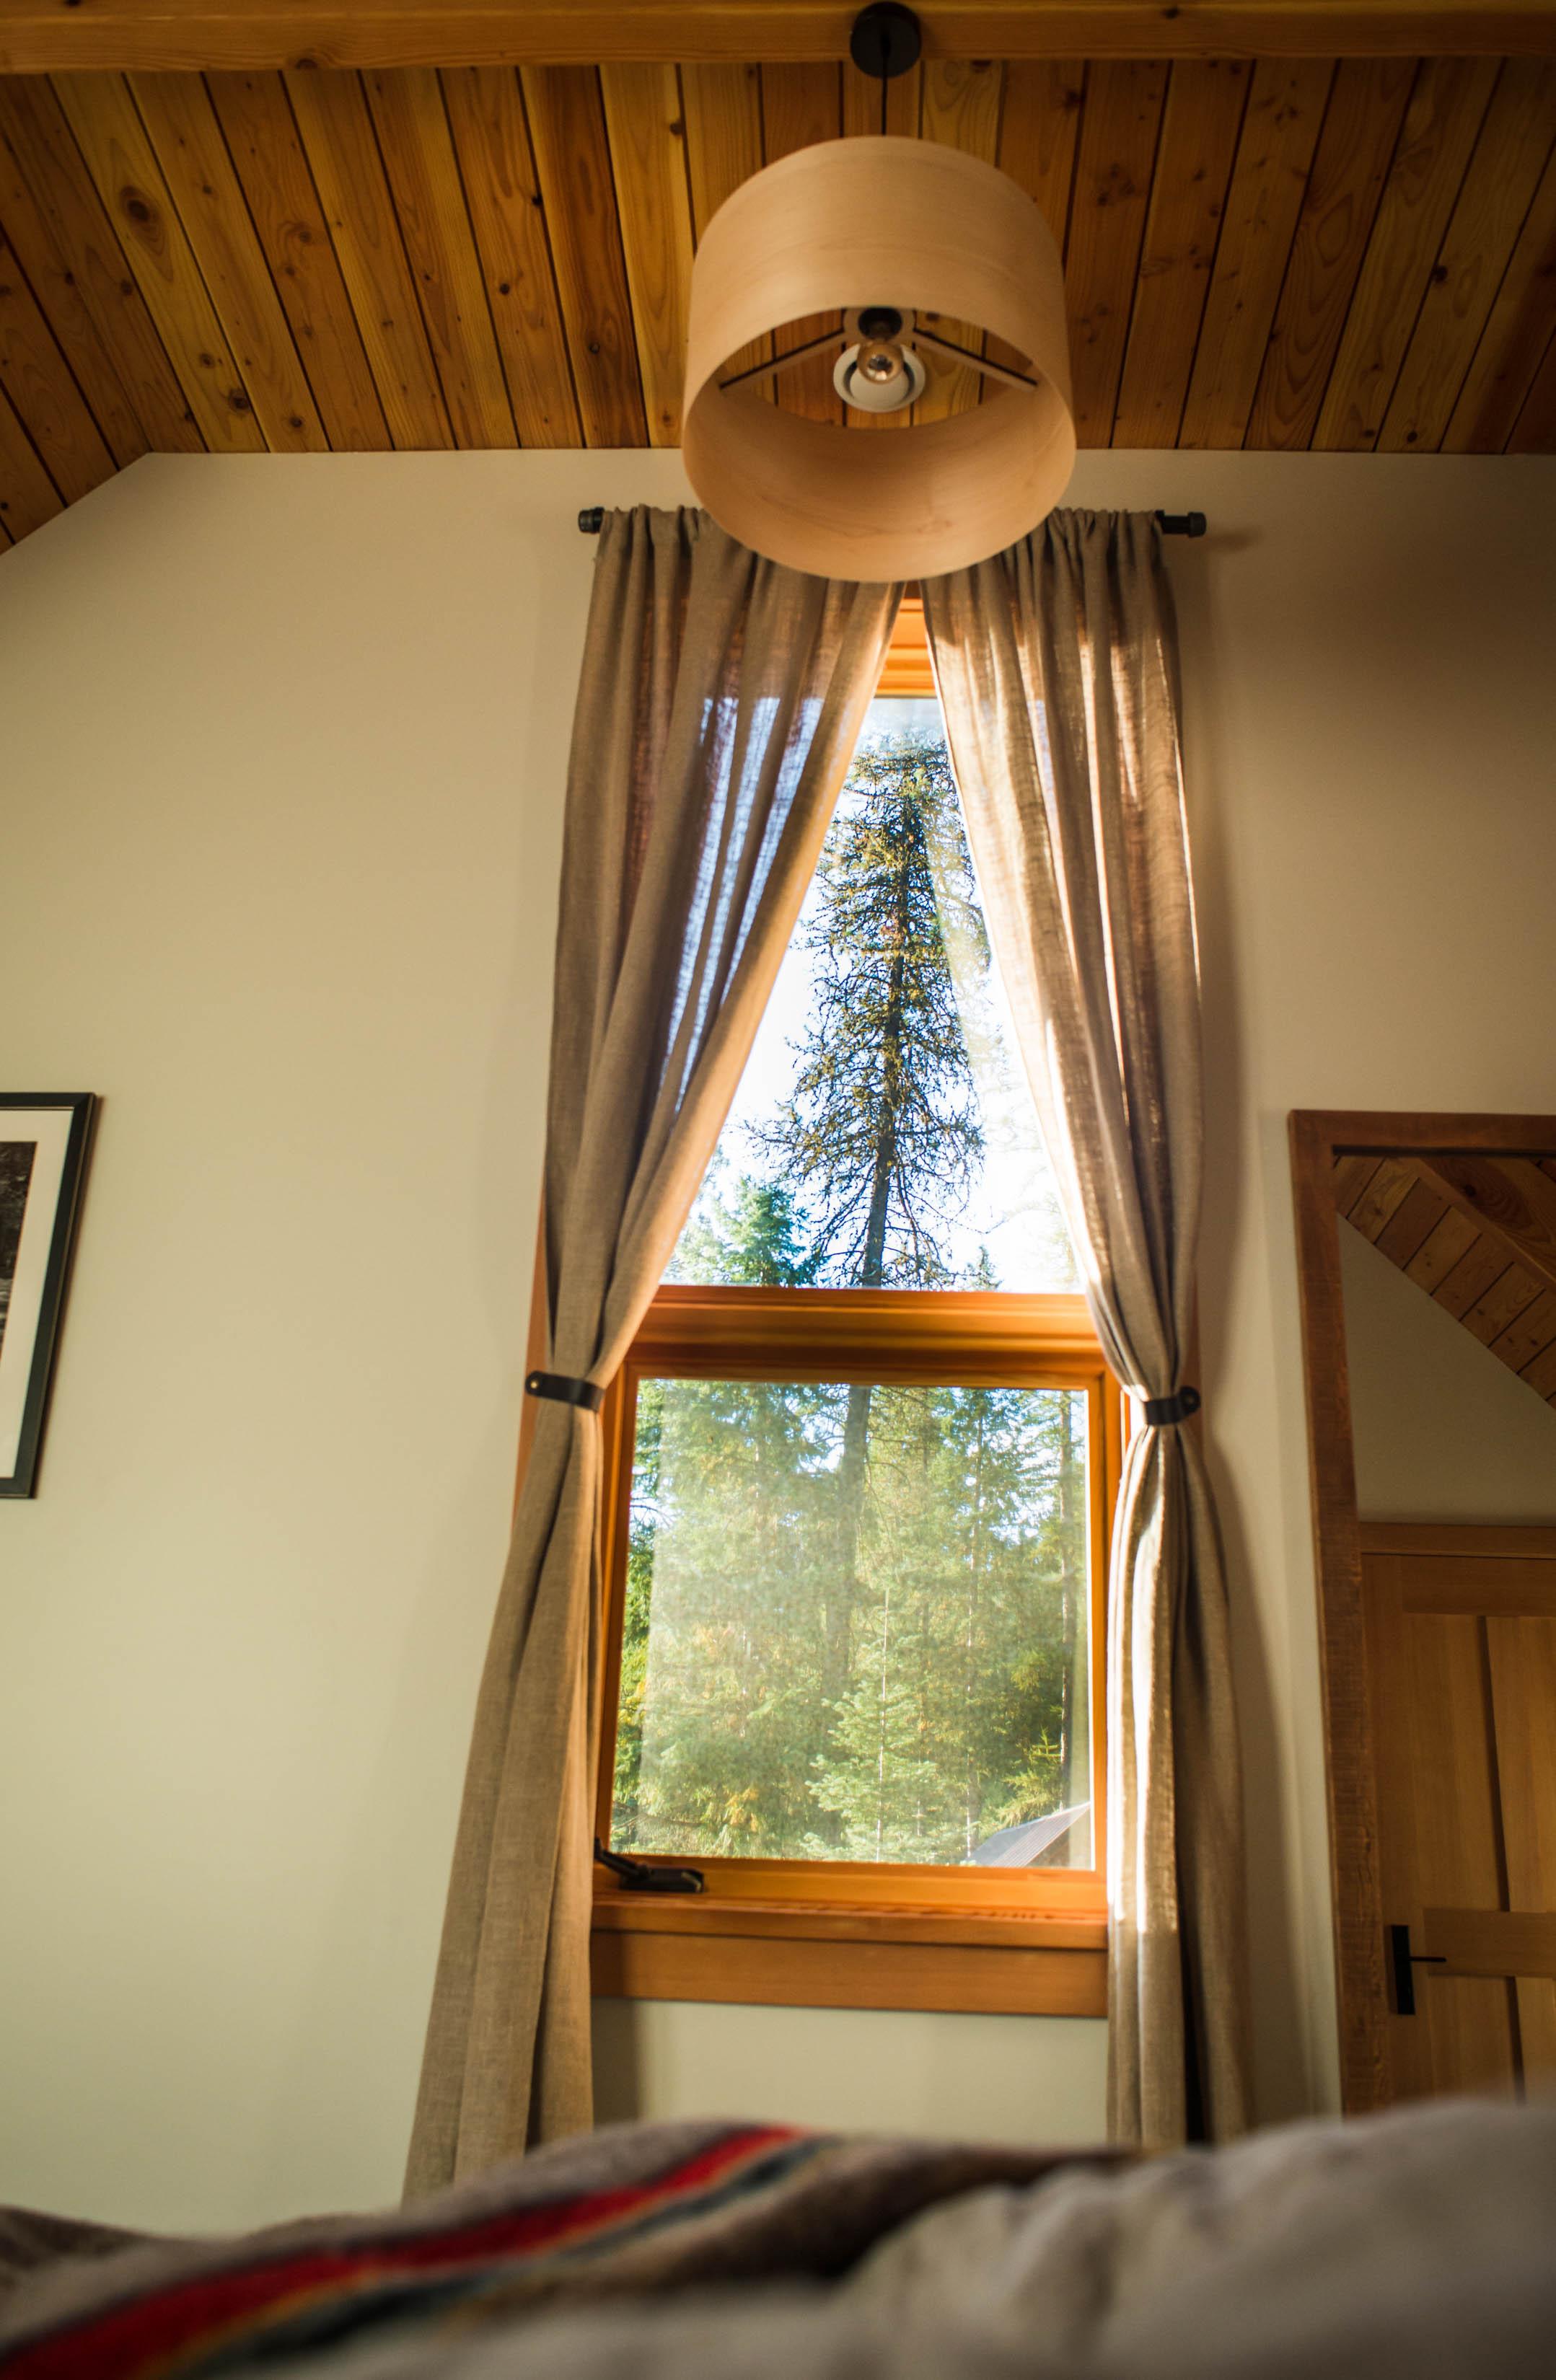 Minam_River_Lodge_Wallowa_Mountains_Eagle_Cap_Wilderness_Oregon_Autumn_2017_Please_Credit_Talia_Jean_Galvin-52.jpg